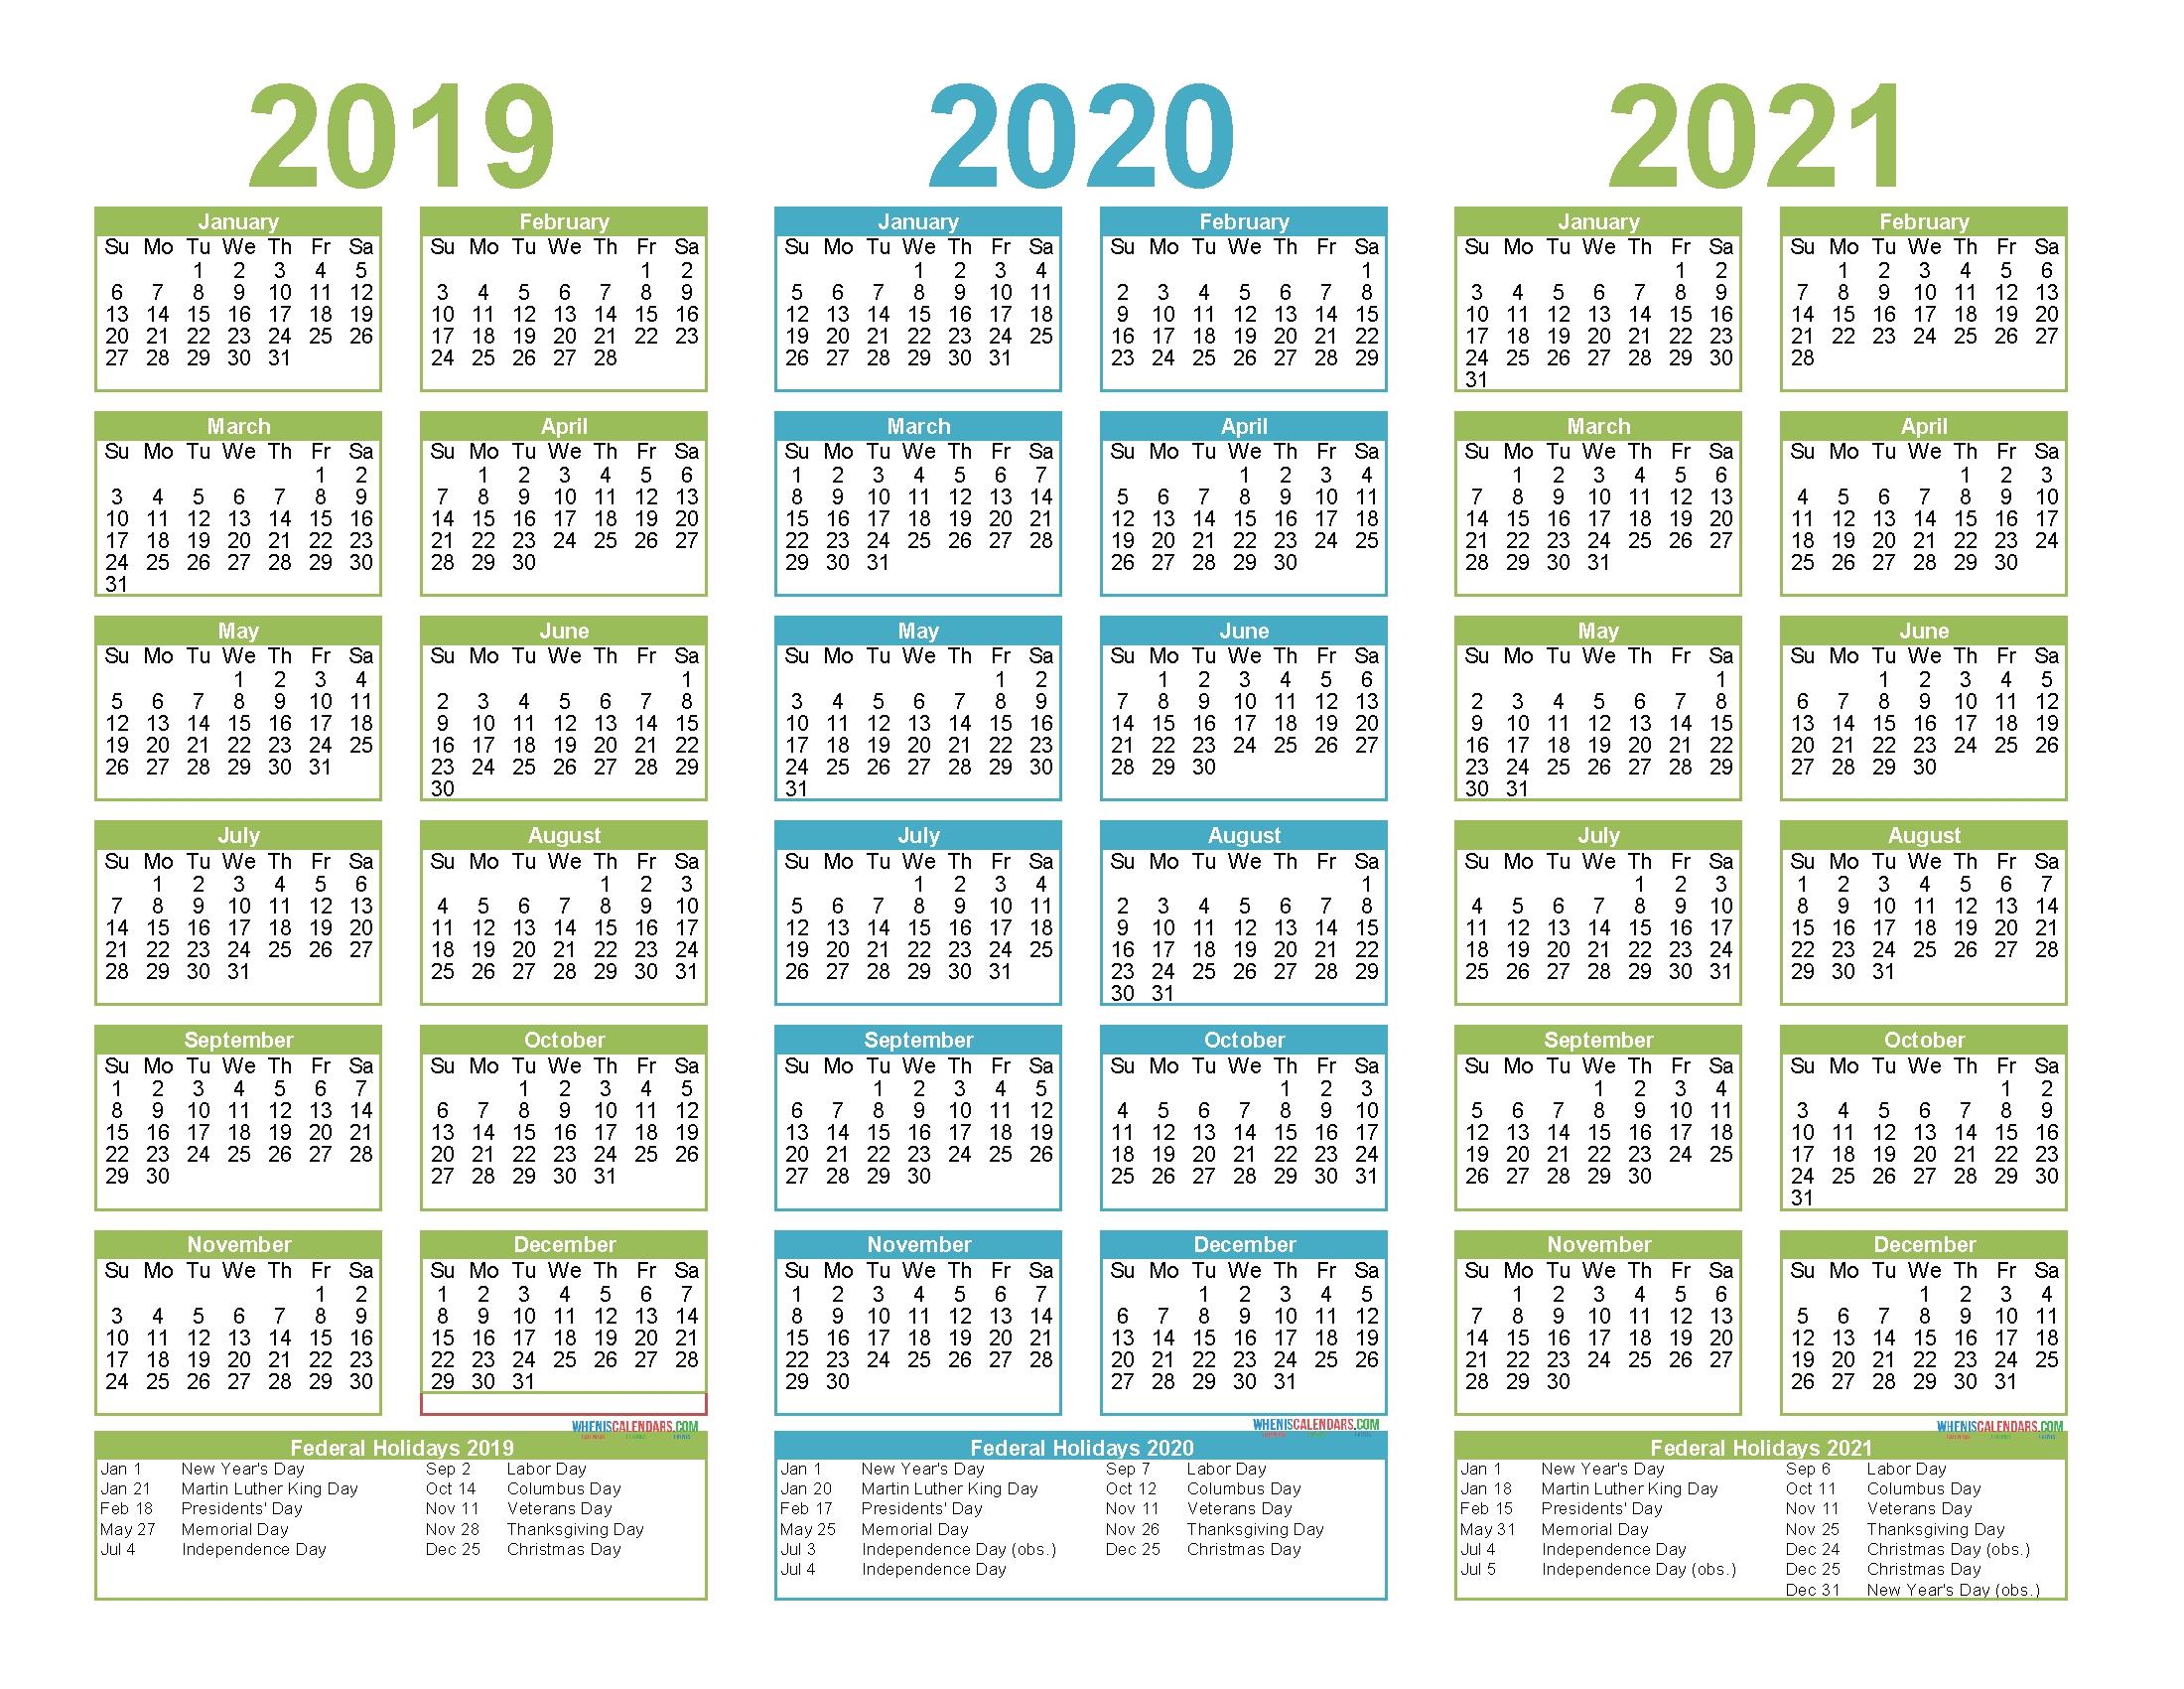 3 Year Calendar Printable 2019 2020 2021 Free Calendar